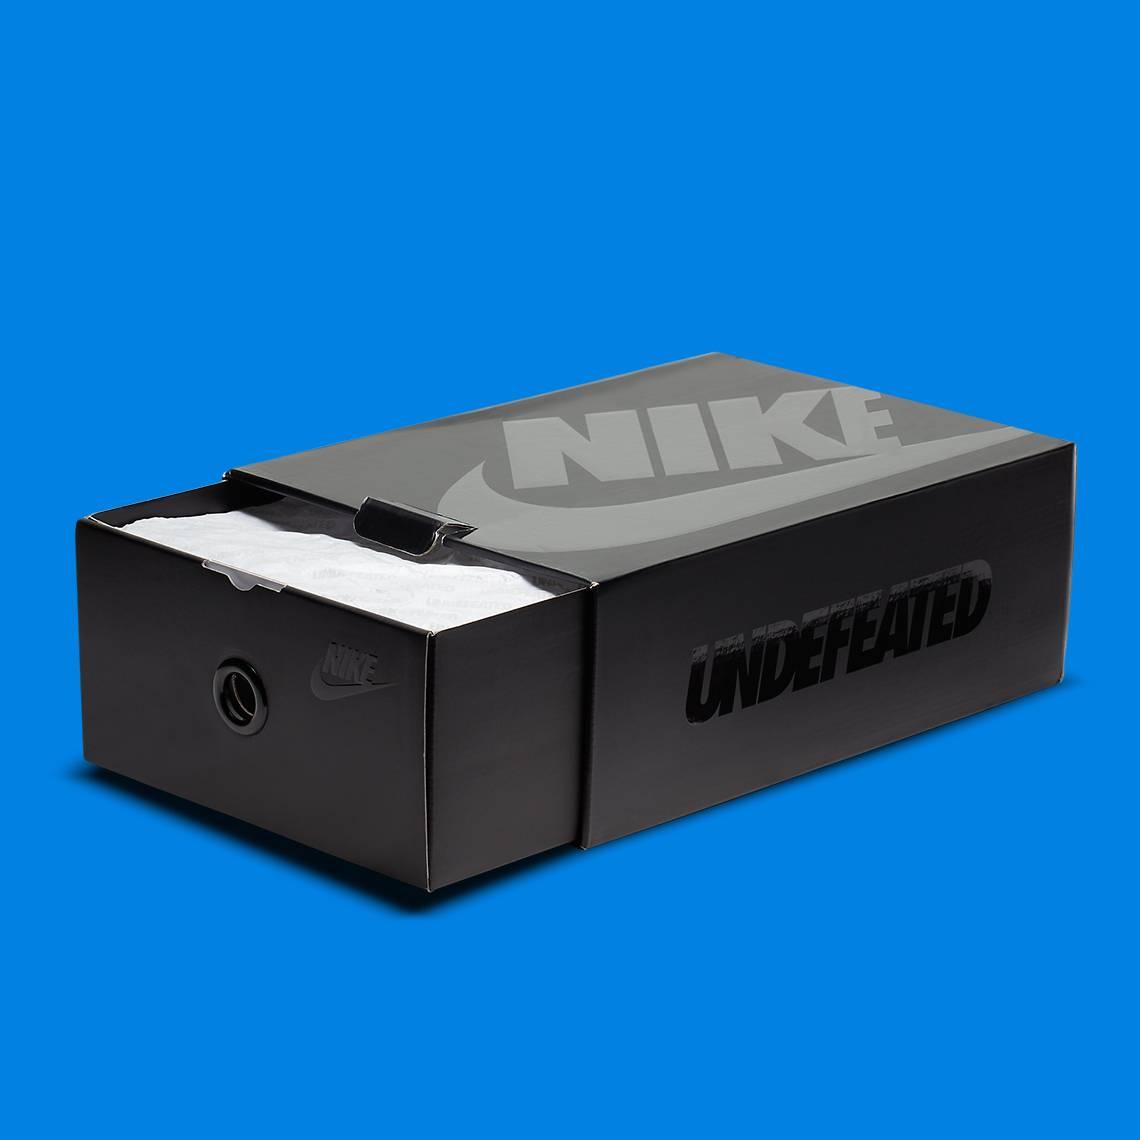 UNDEFEATED 與 Nike Air Max 97新色「UCLA」預覽!簡約明亮色調極注目